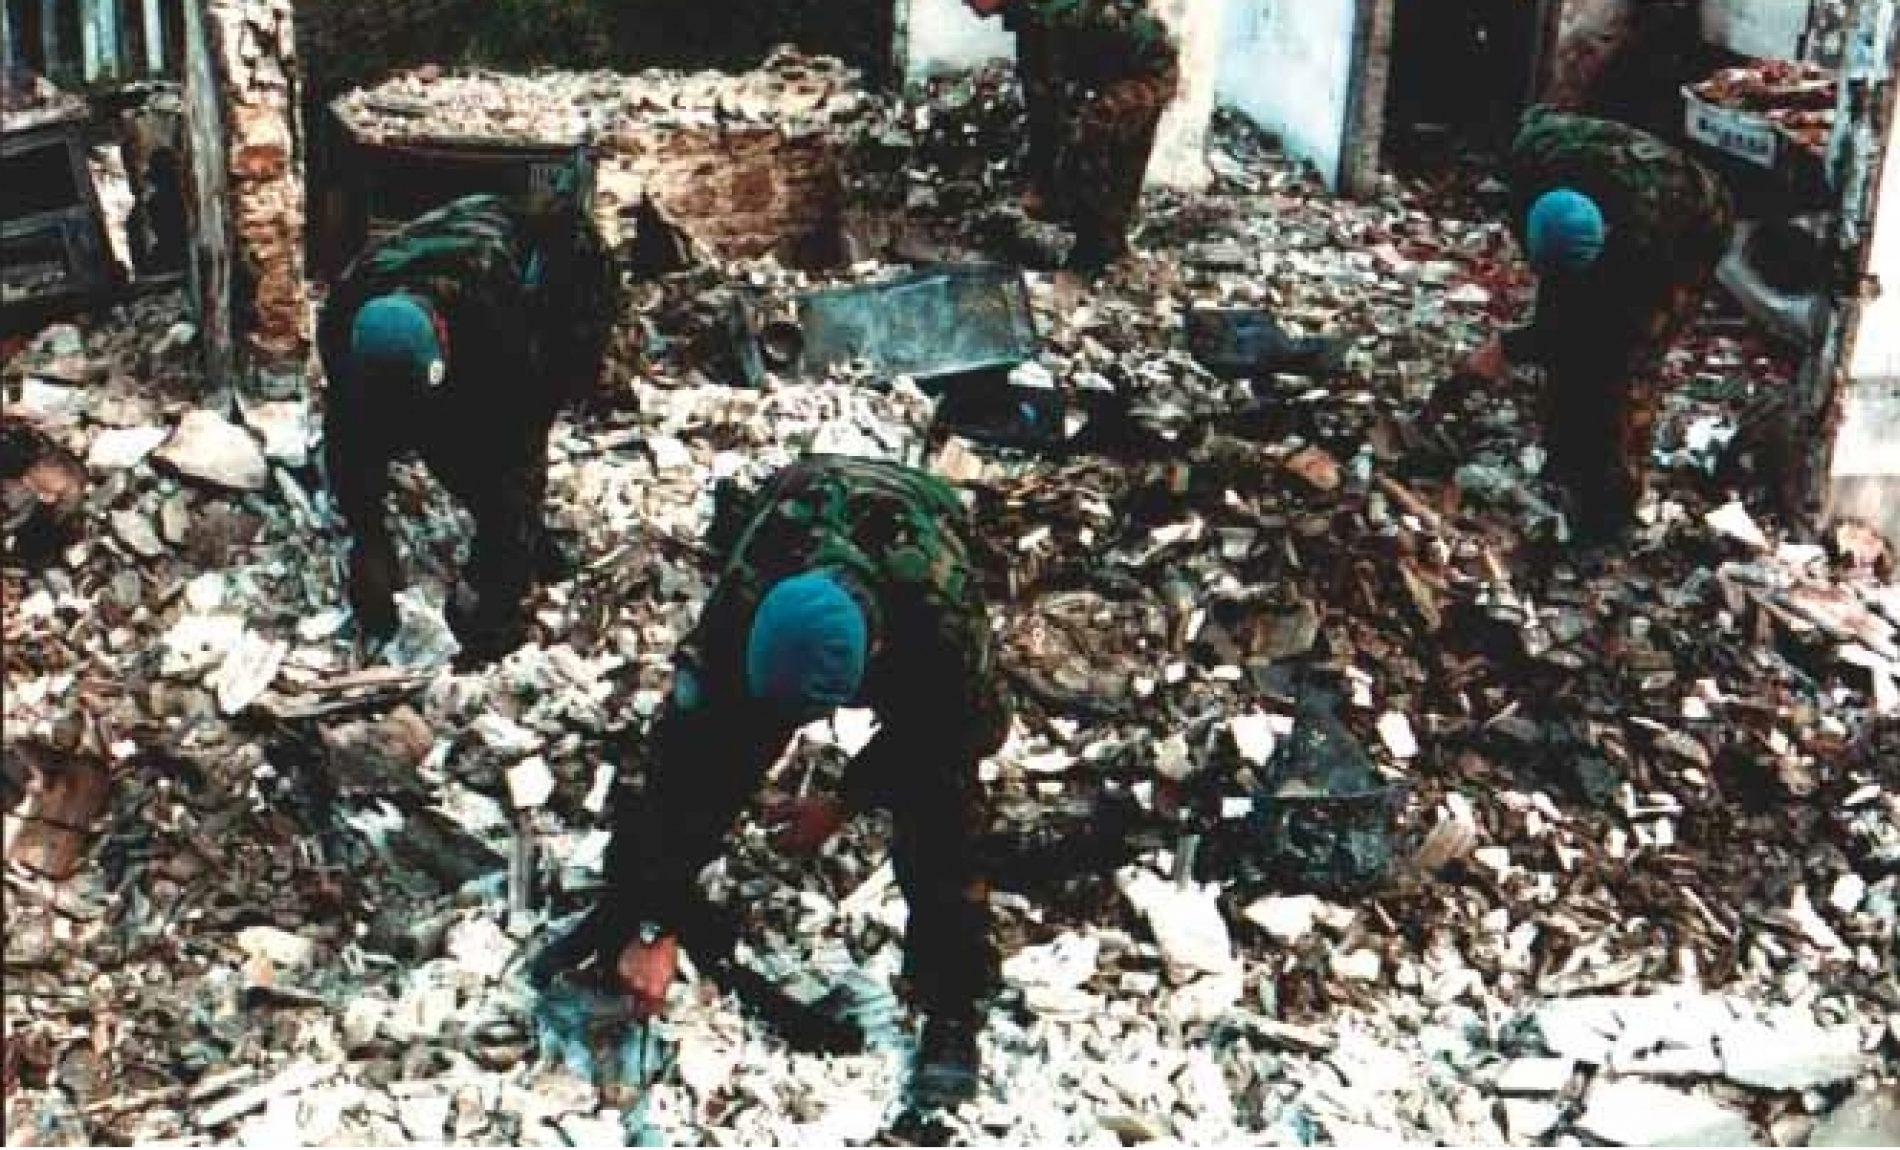 Zločin u Stupnom Dolu: Smrt 44 čovjeka bez sudske pravde